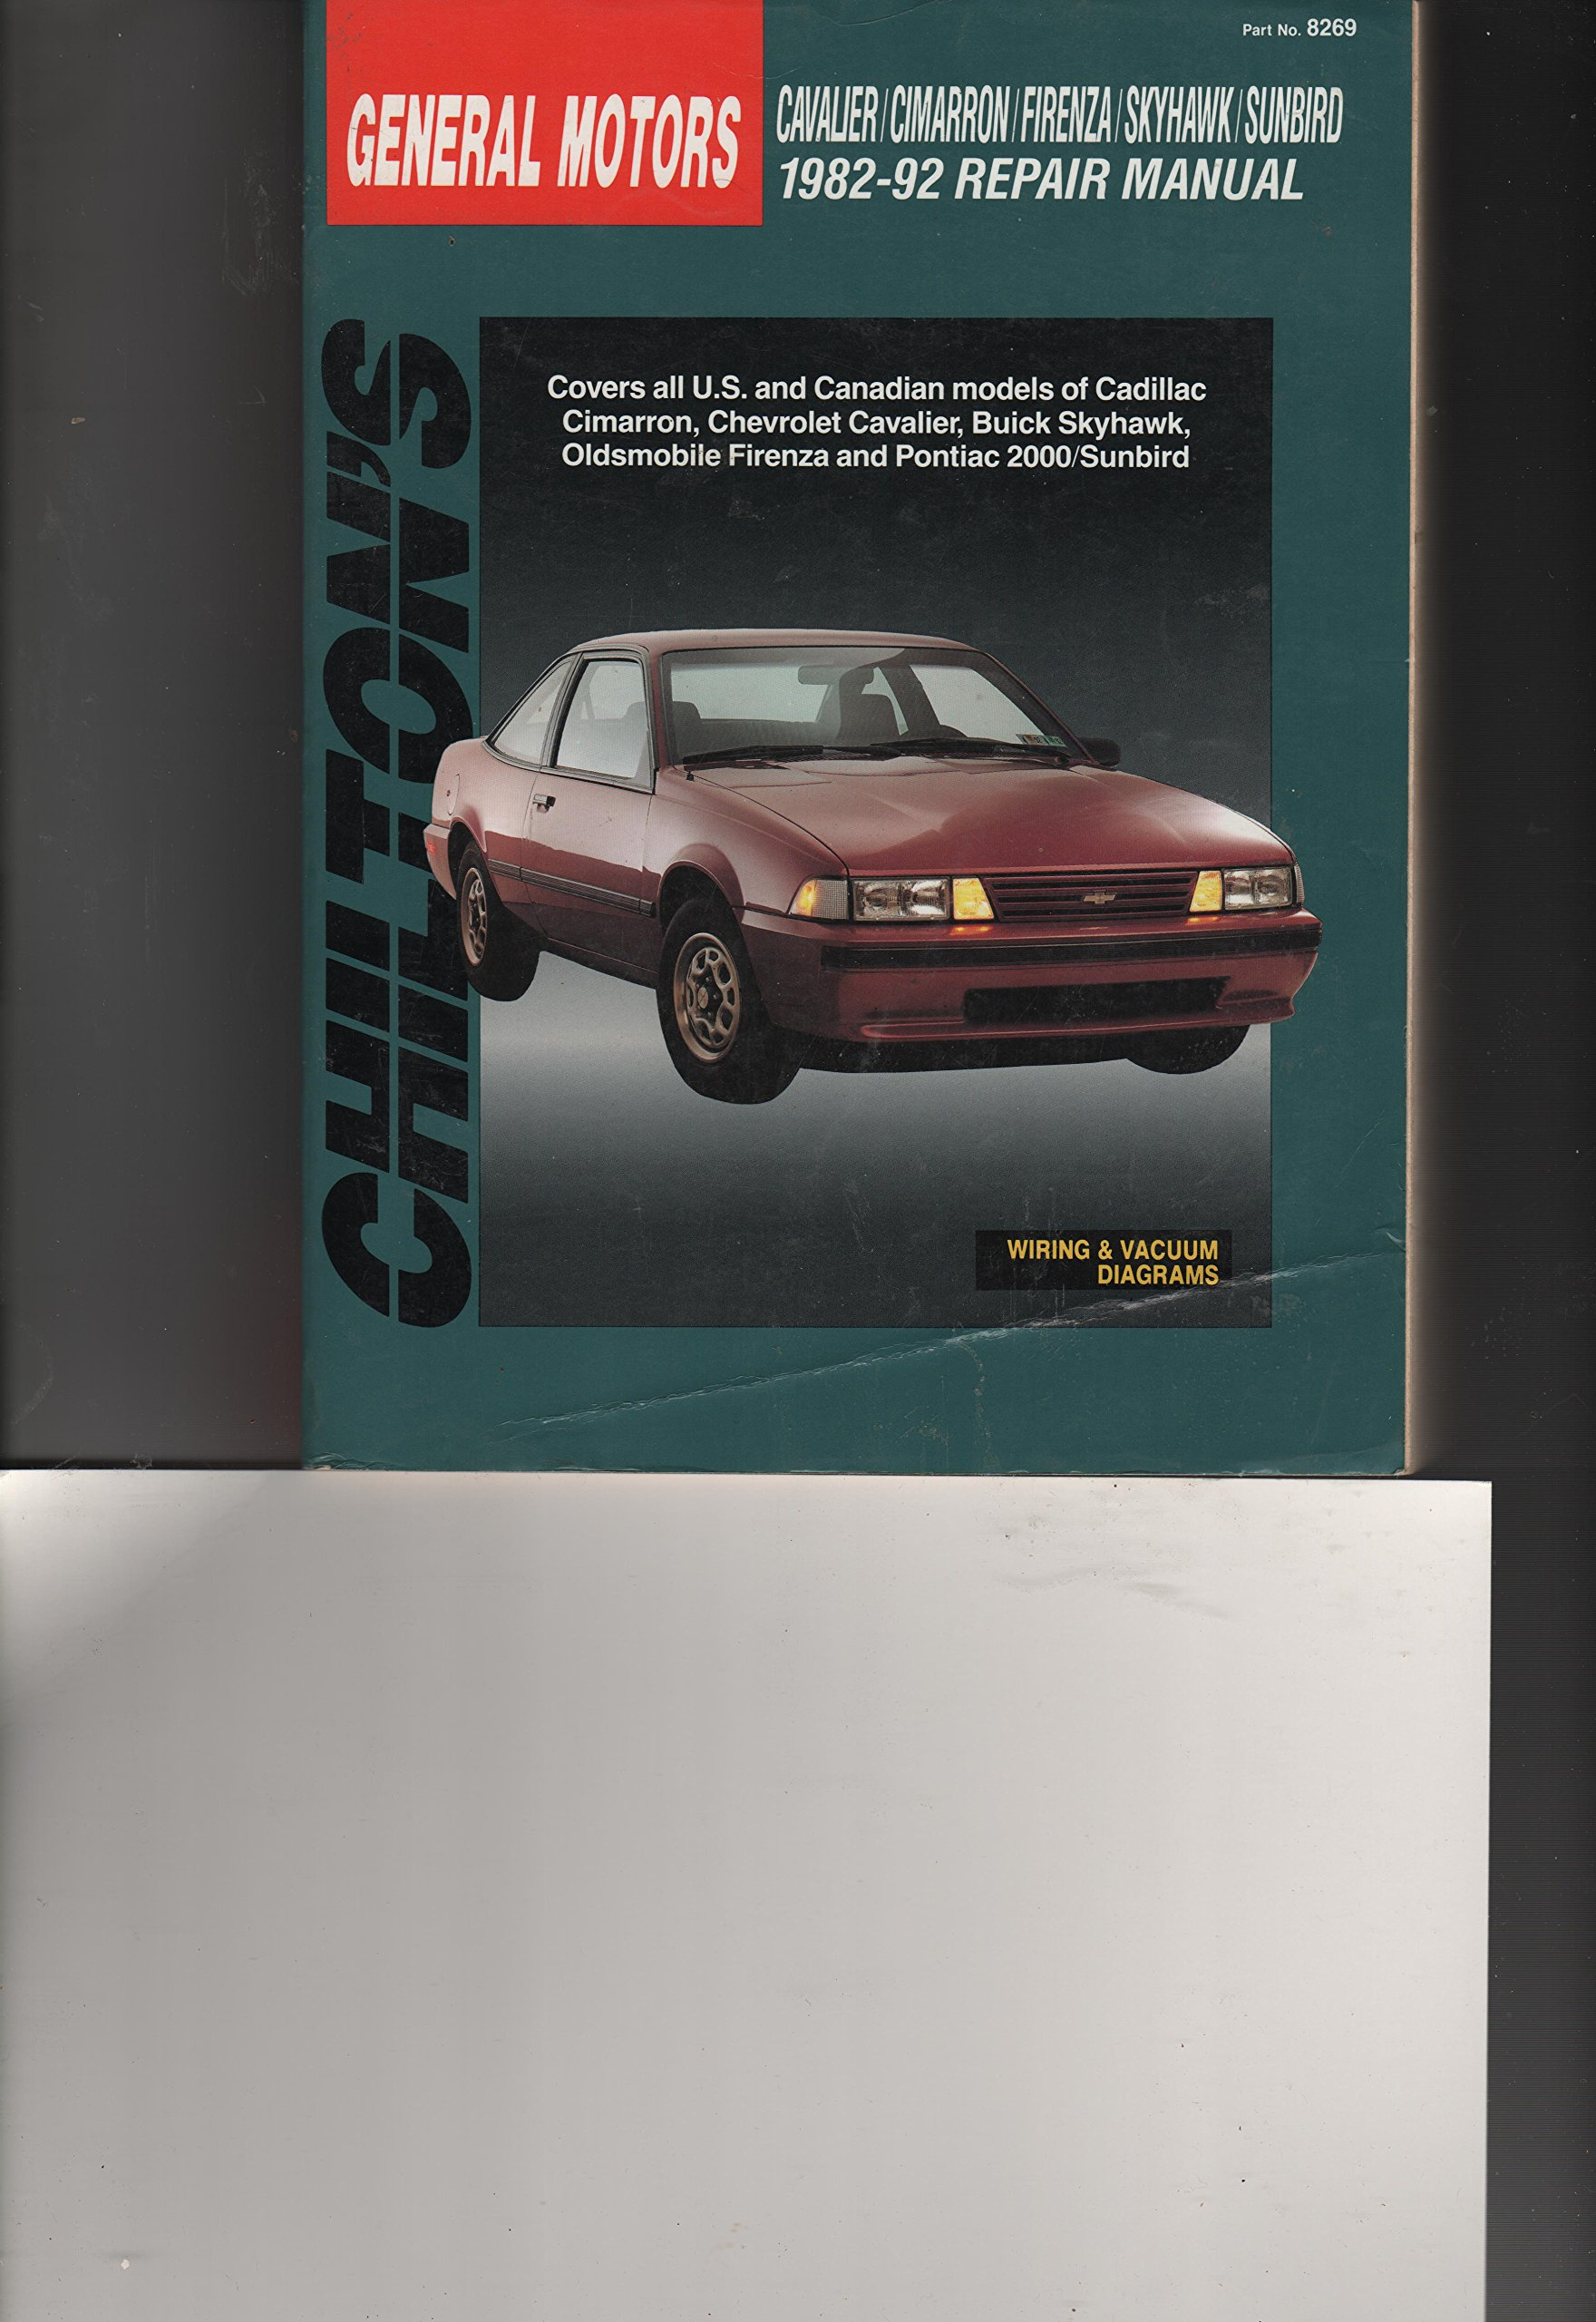 Chilton's General Motors: Cavalier/Cimarron/Firenza/Skyhawk/Sunbird, 1982-92  Repair Manual: Dean F. Morgantini: 9780801982699: Books - Amazon.ca